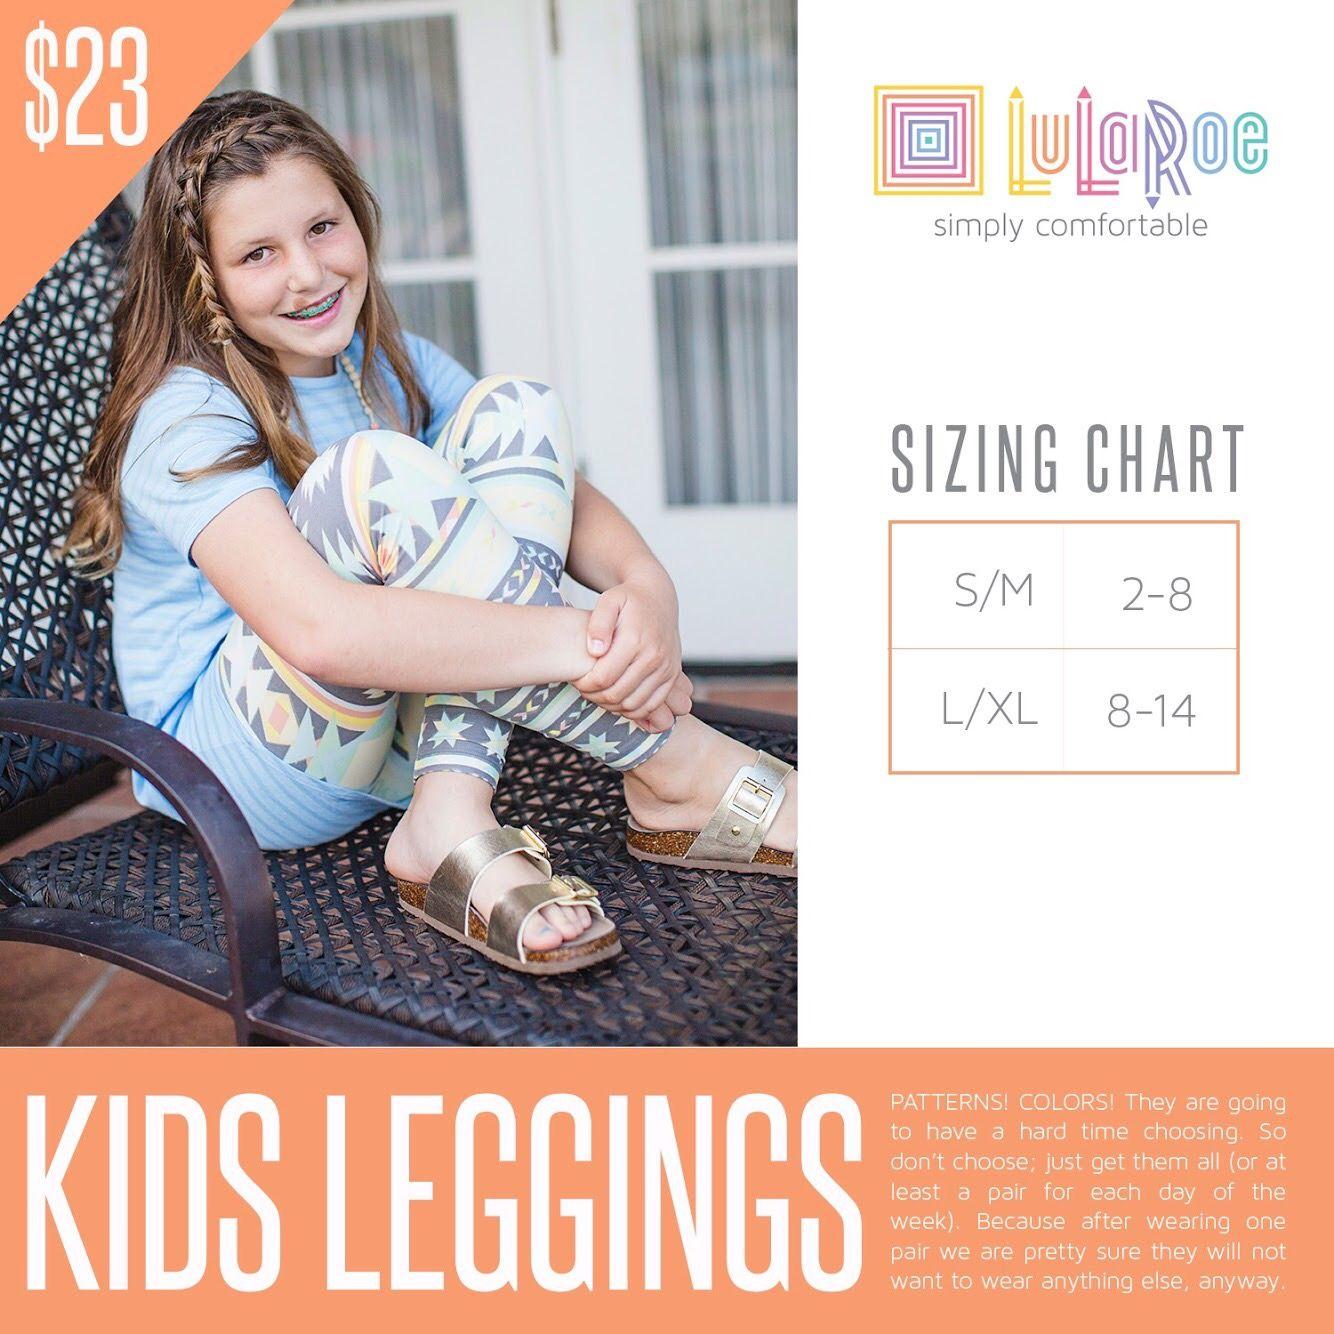 2825f3de5d5819 LuLaRoe Kids Leggings Size Chart. See our current collection here -  www.facebook.com/groups/LuLaRoeGilbertGirls/